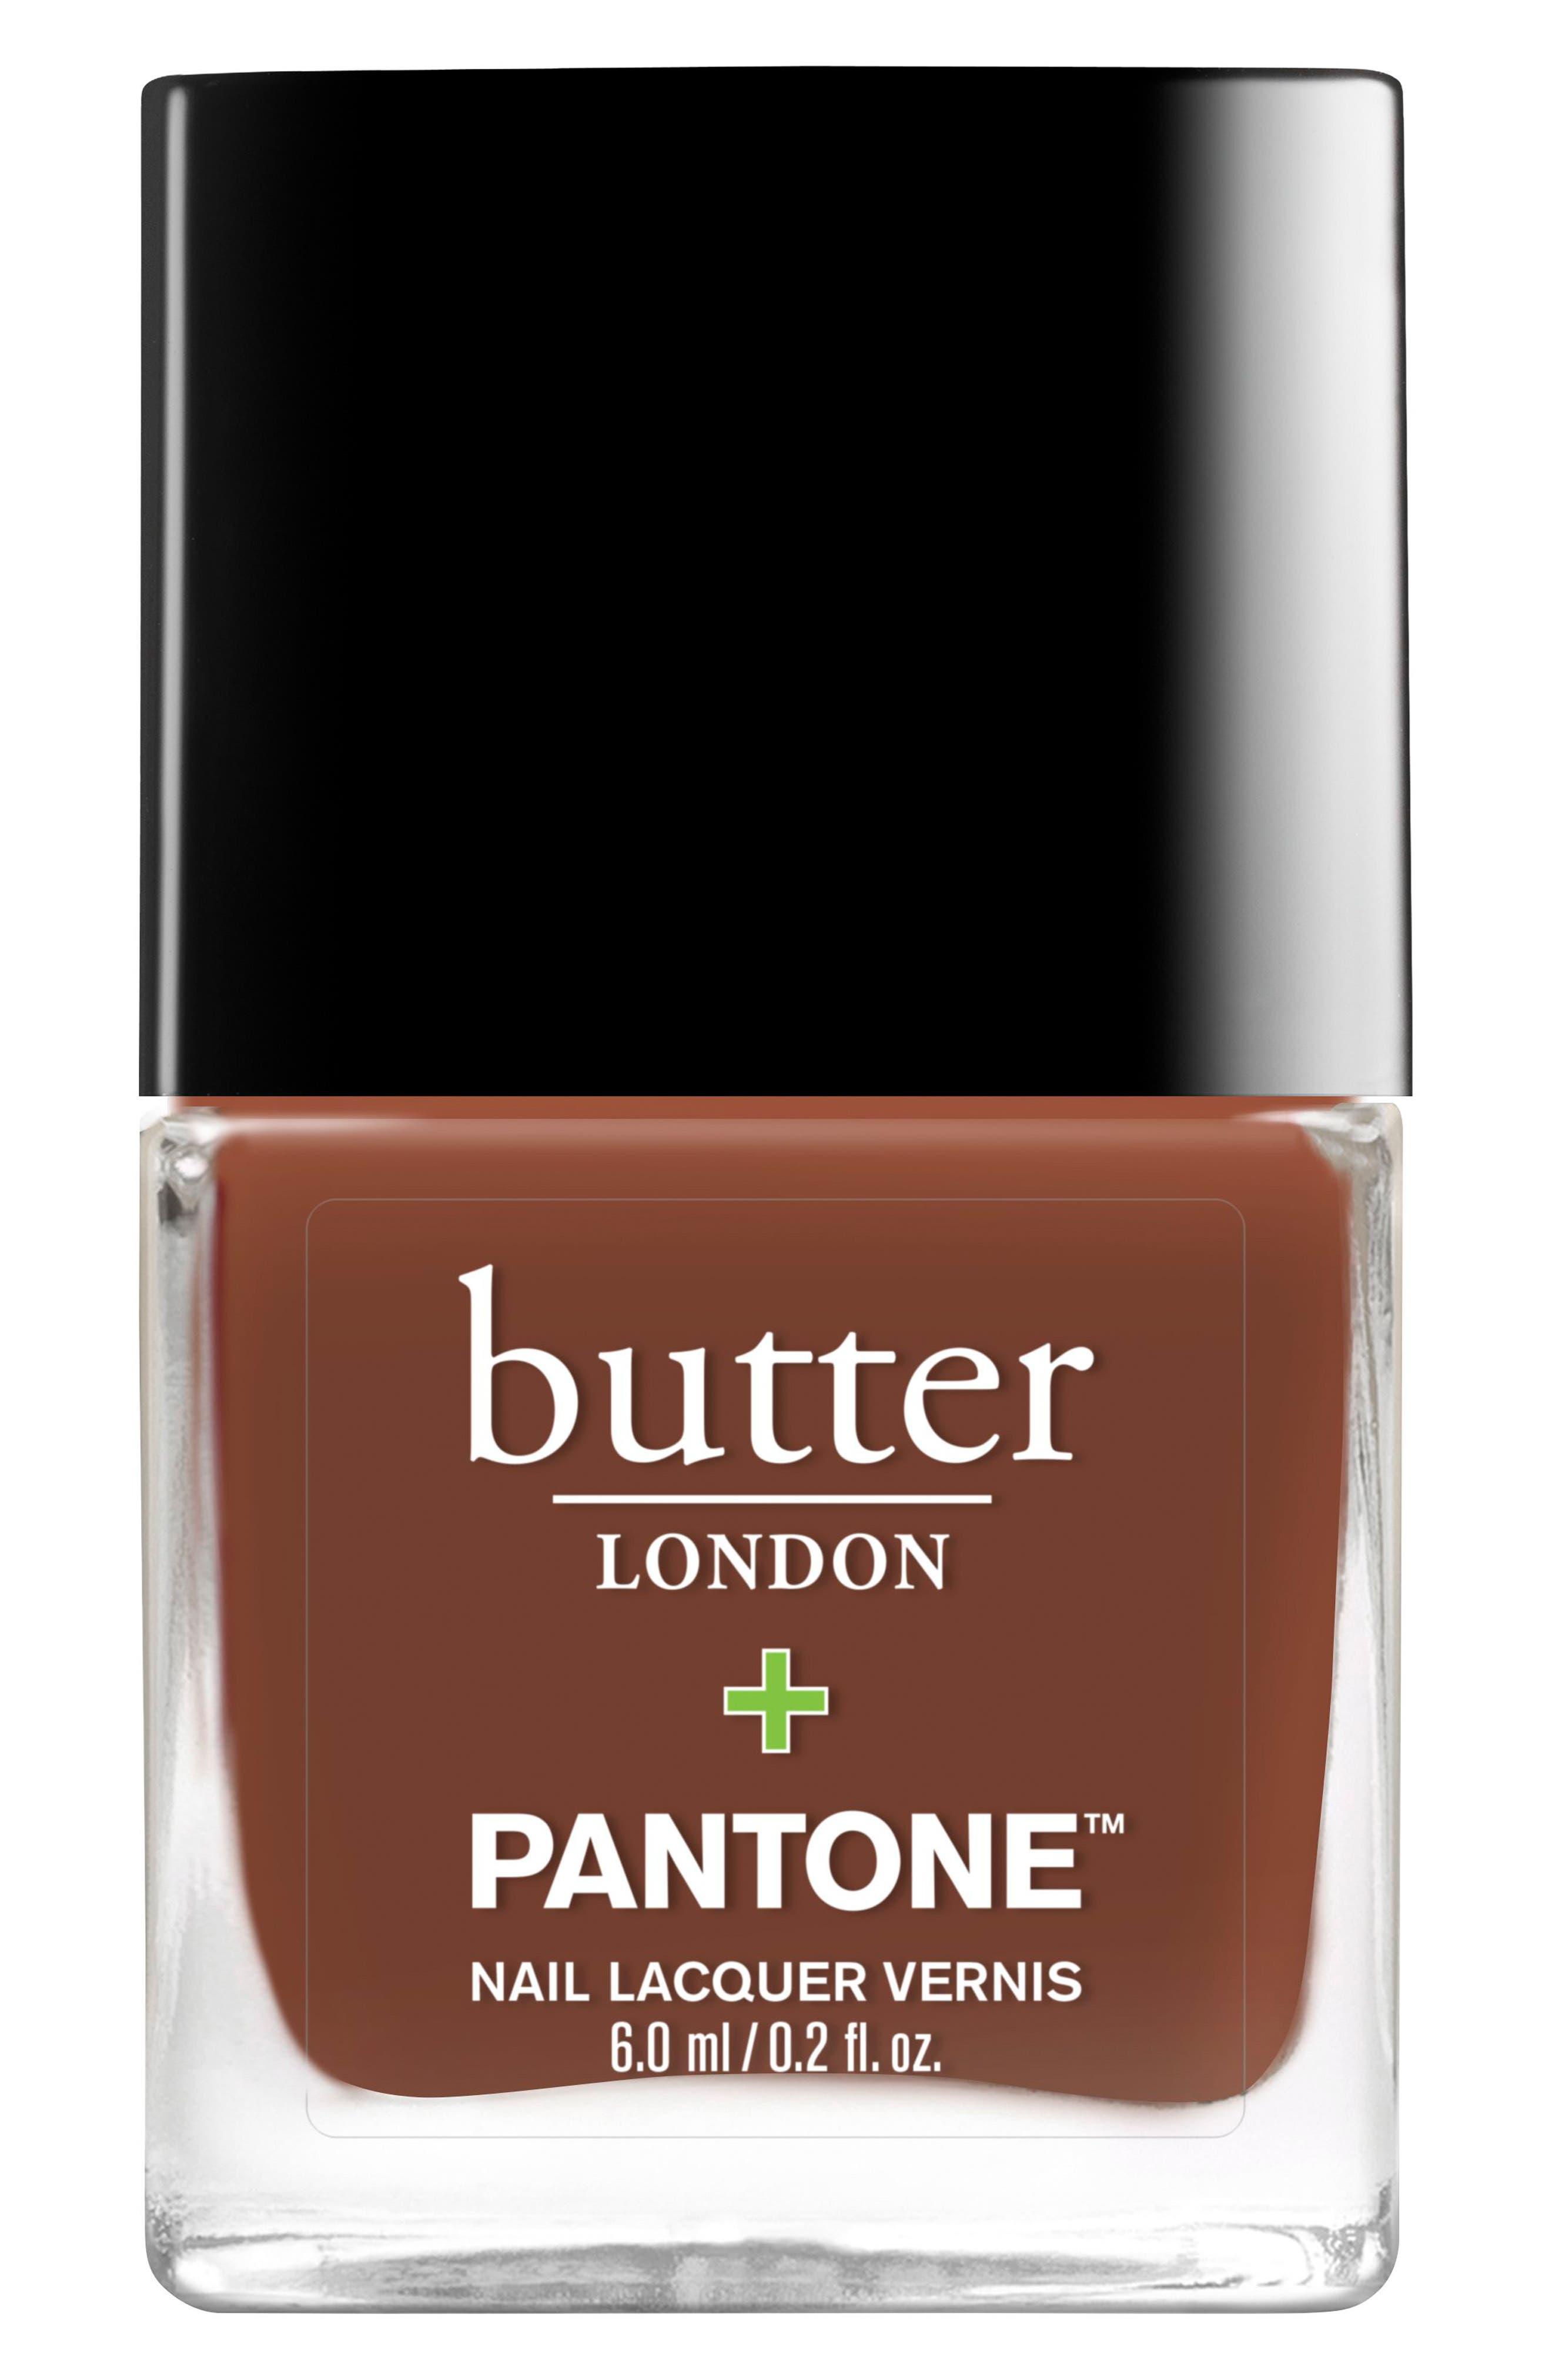 BUTTER LONDON Pantone Trend Mini Nail Lacquer